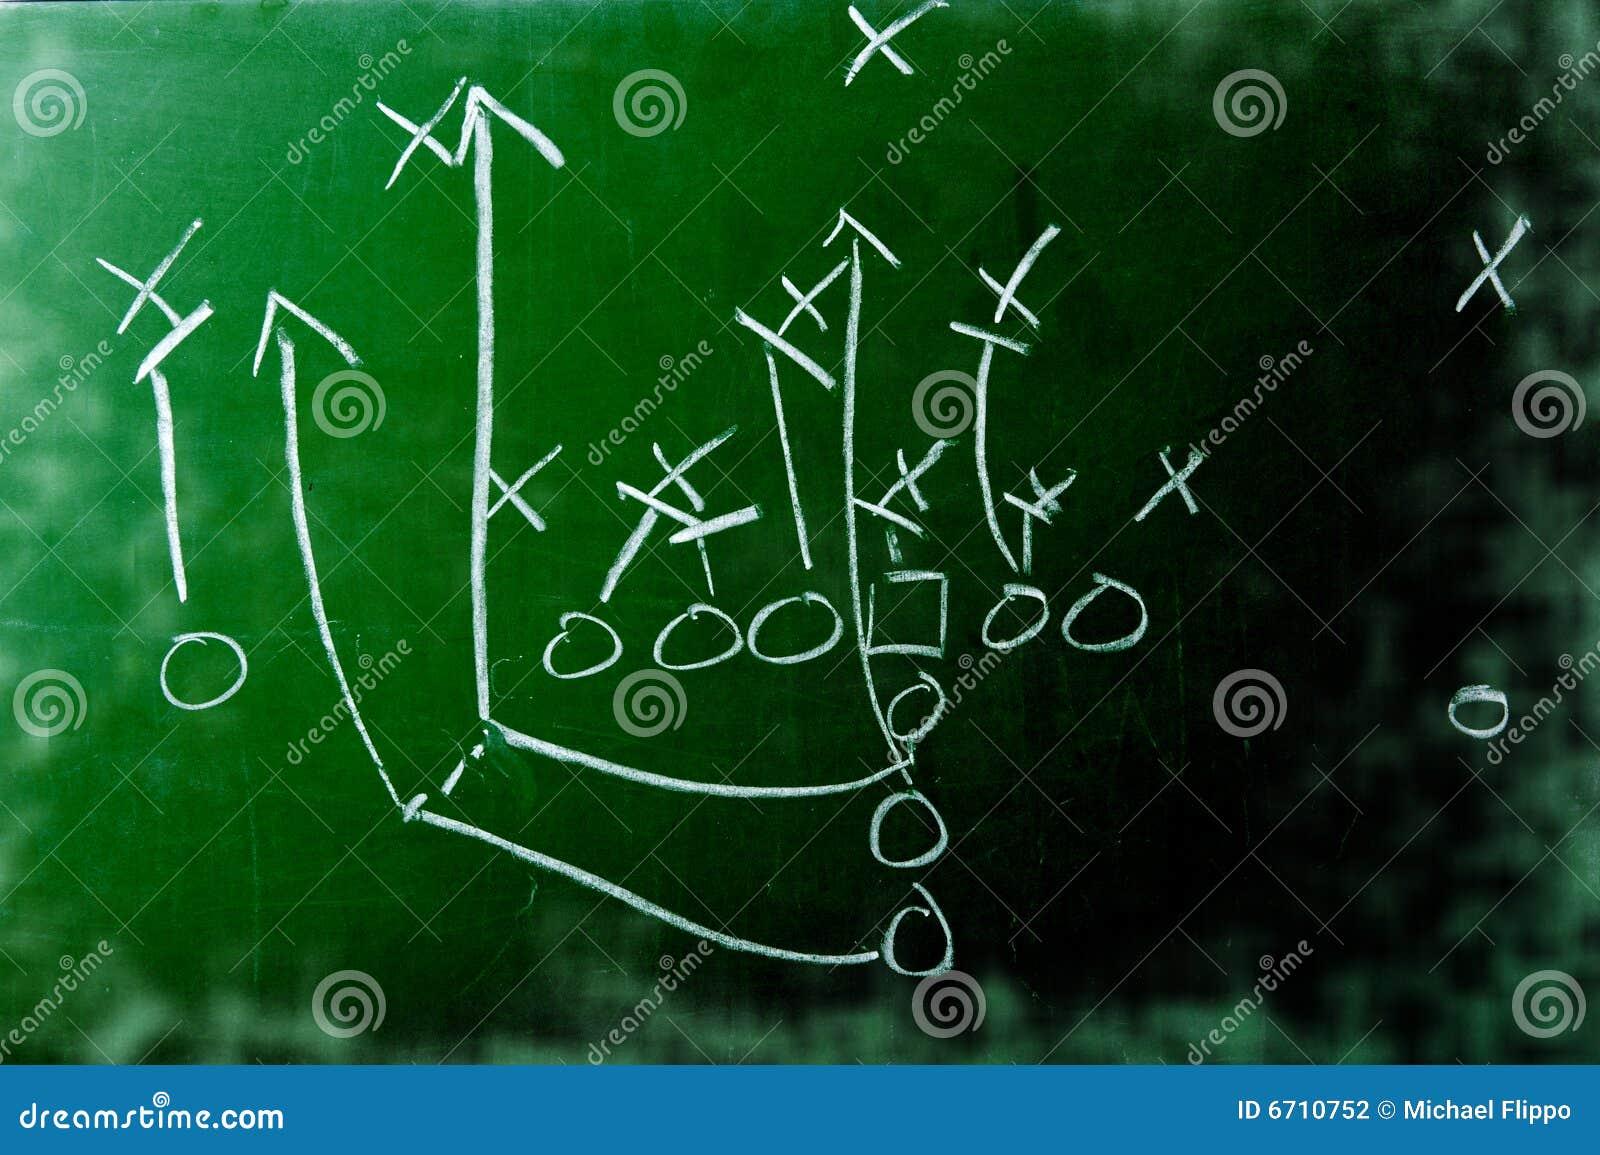 Football Play Diagram Chalkboard